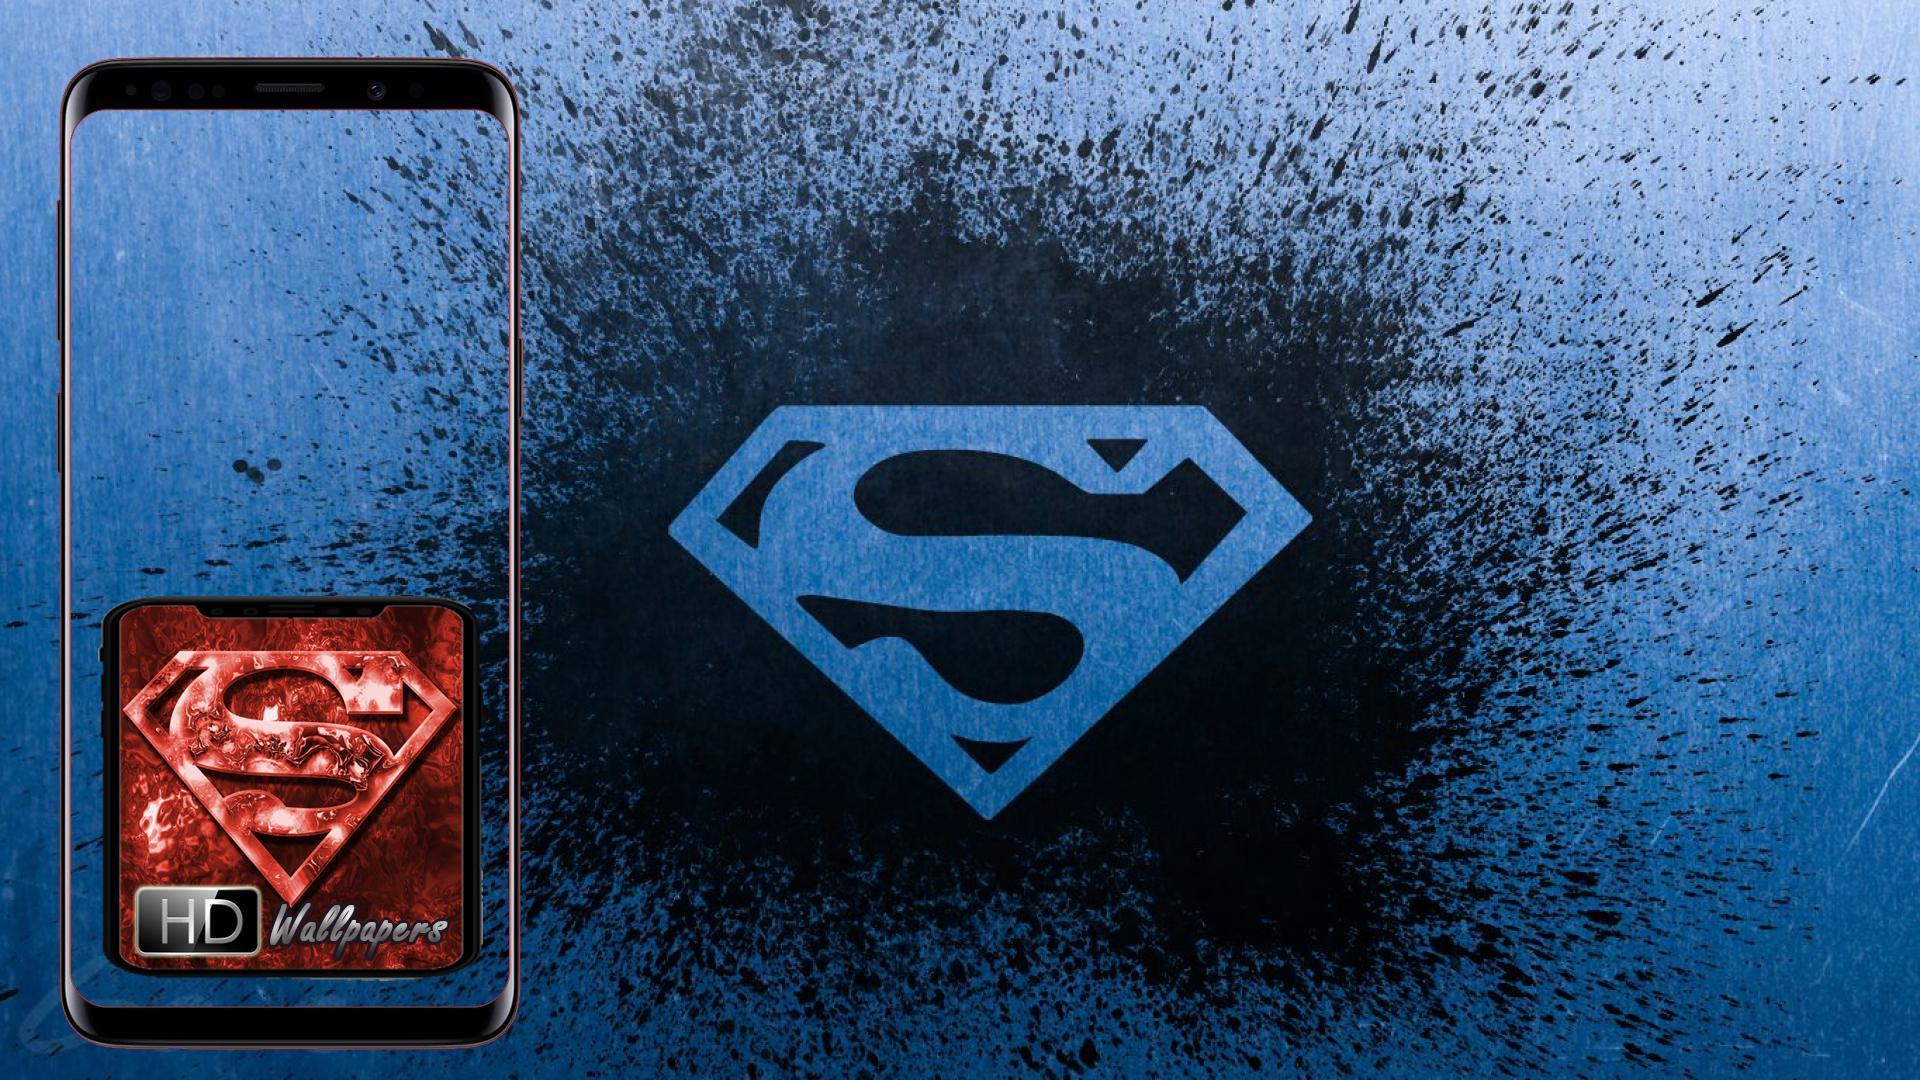 Unduh 100+ Wallpaper Hd Android Superman  Gratis